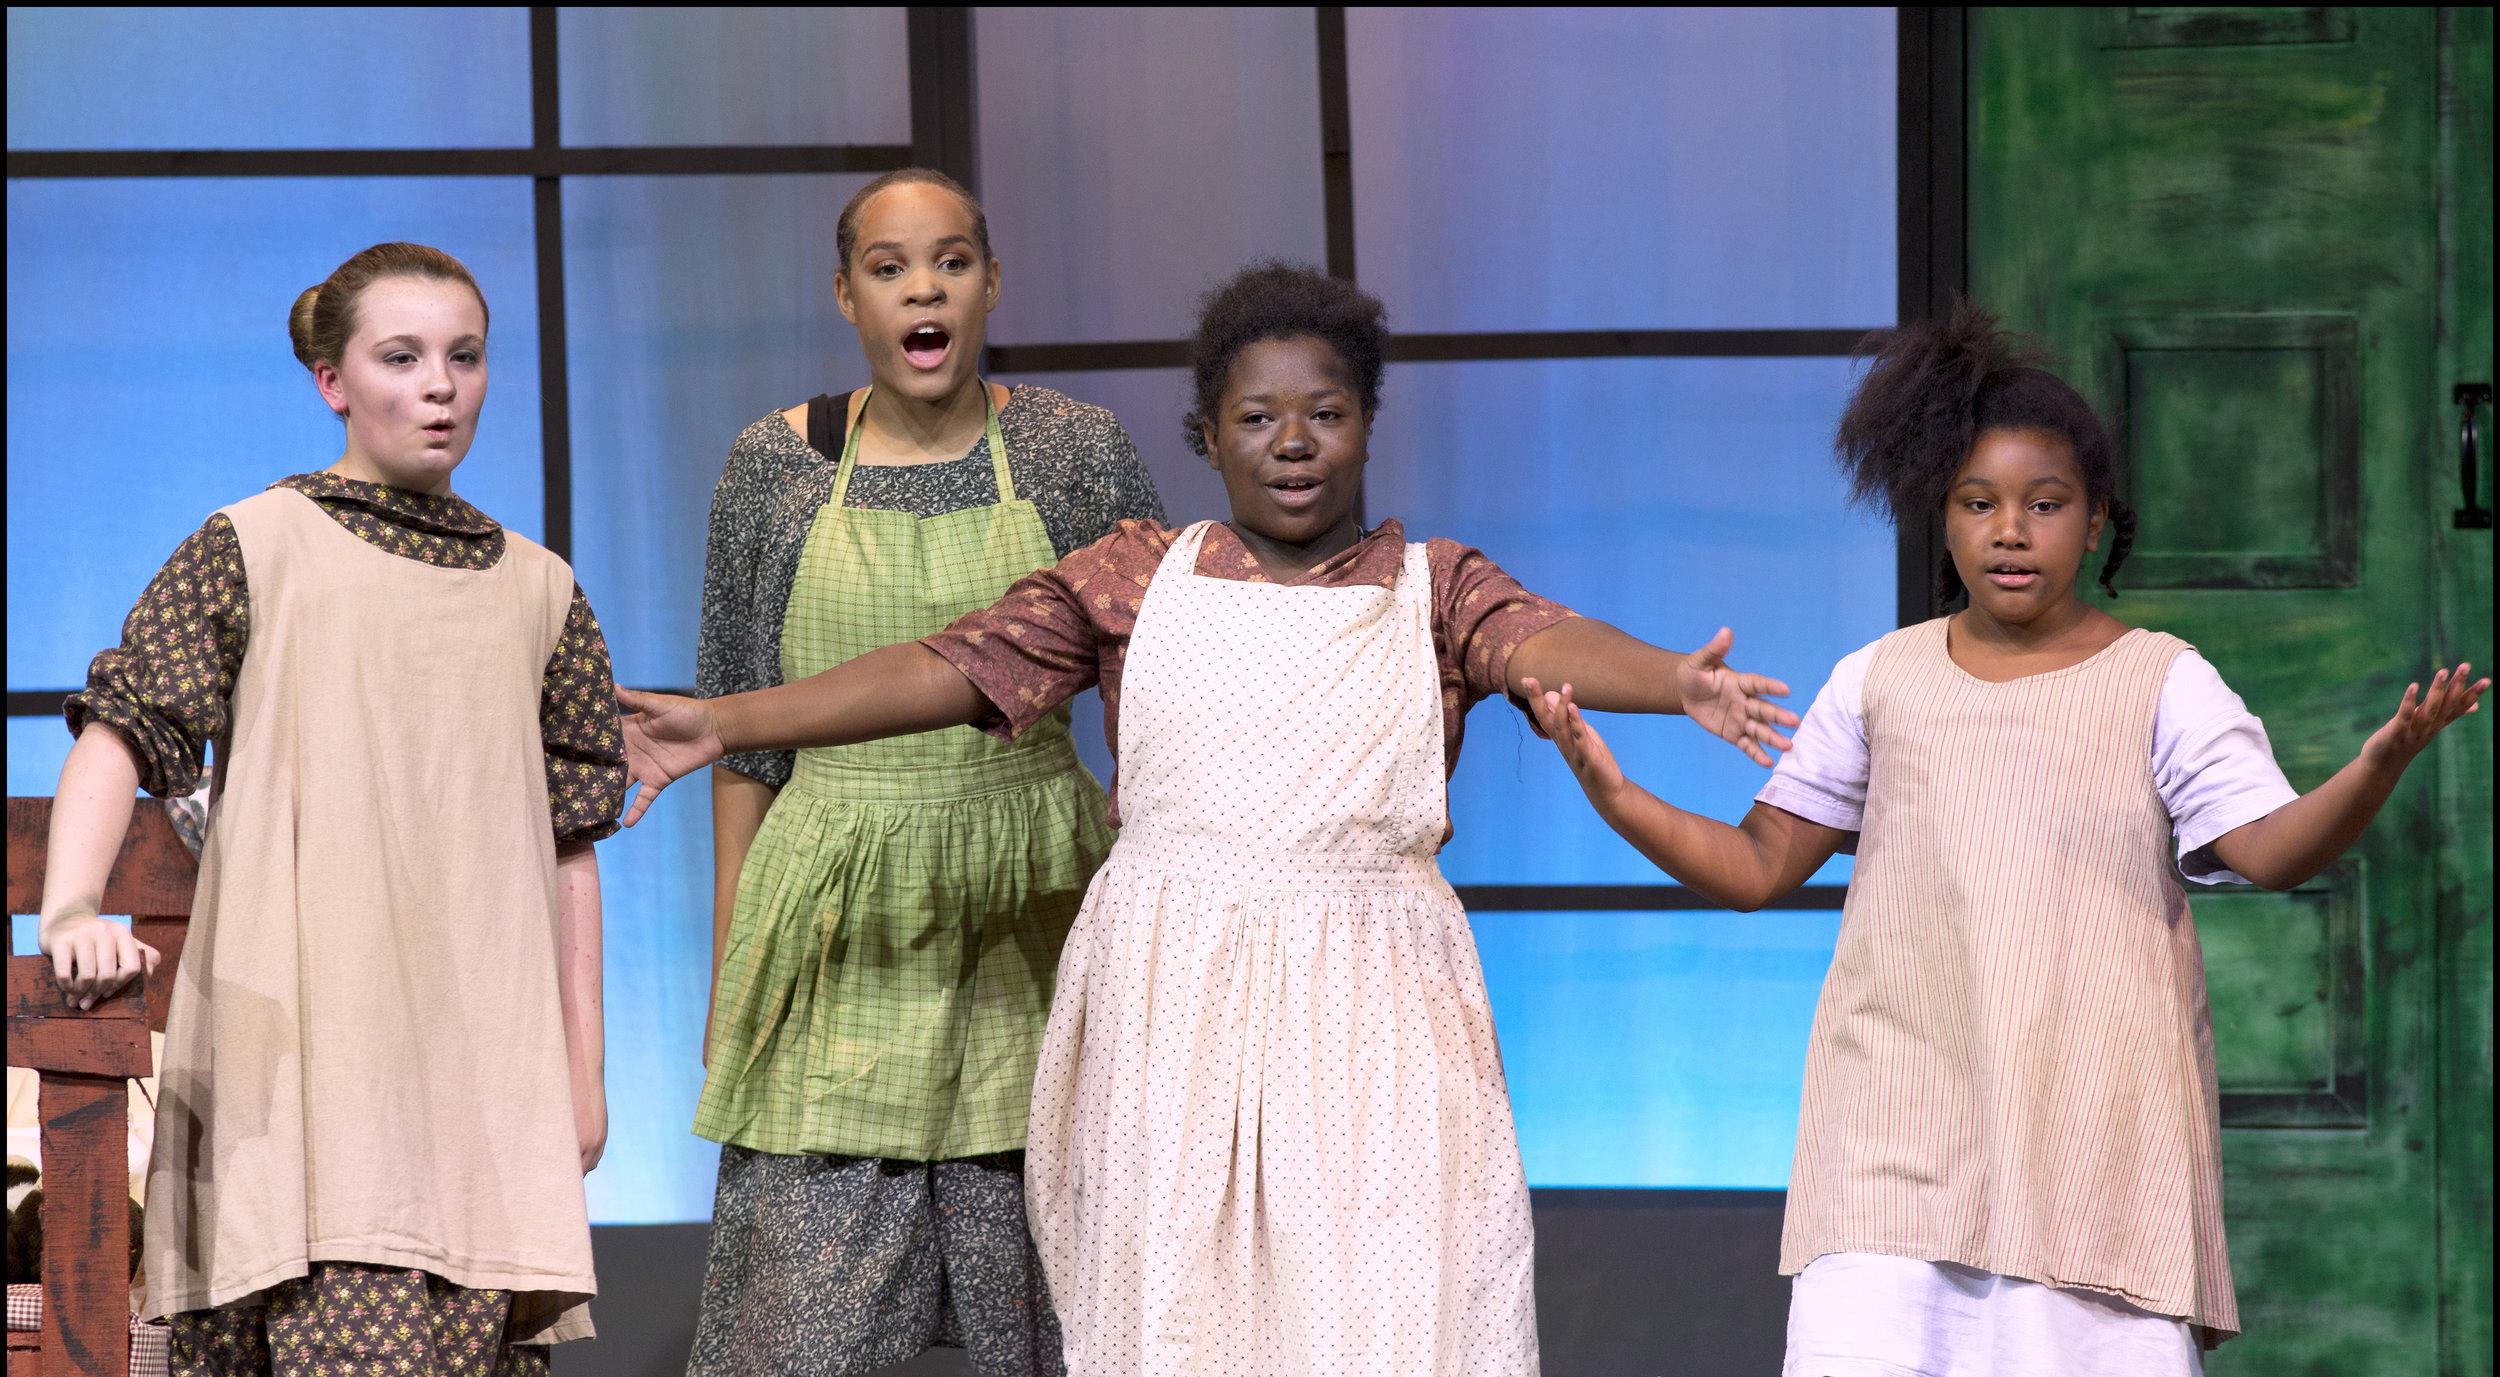 """It's a Hard Knock Life"" orphans pictured left to right are Dayva Sugg, Rebekah Lemon , J'Nyah Corbett and Alisa Washington."